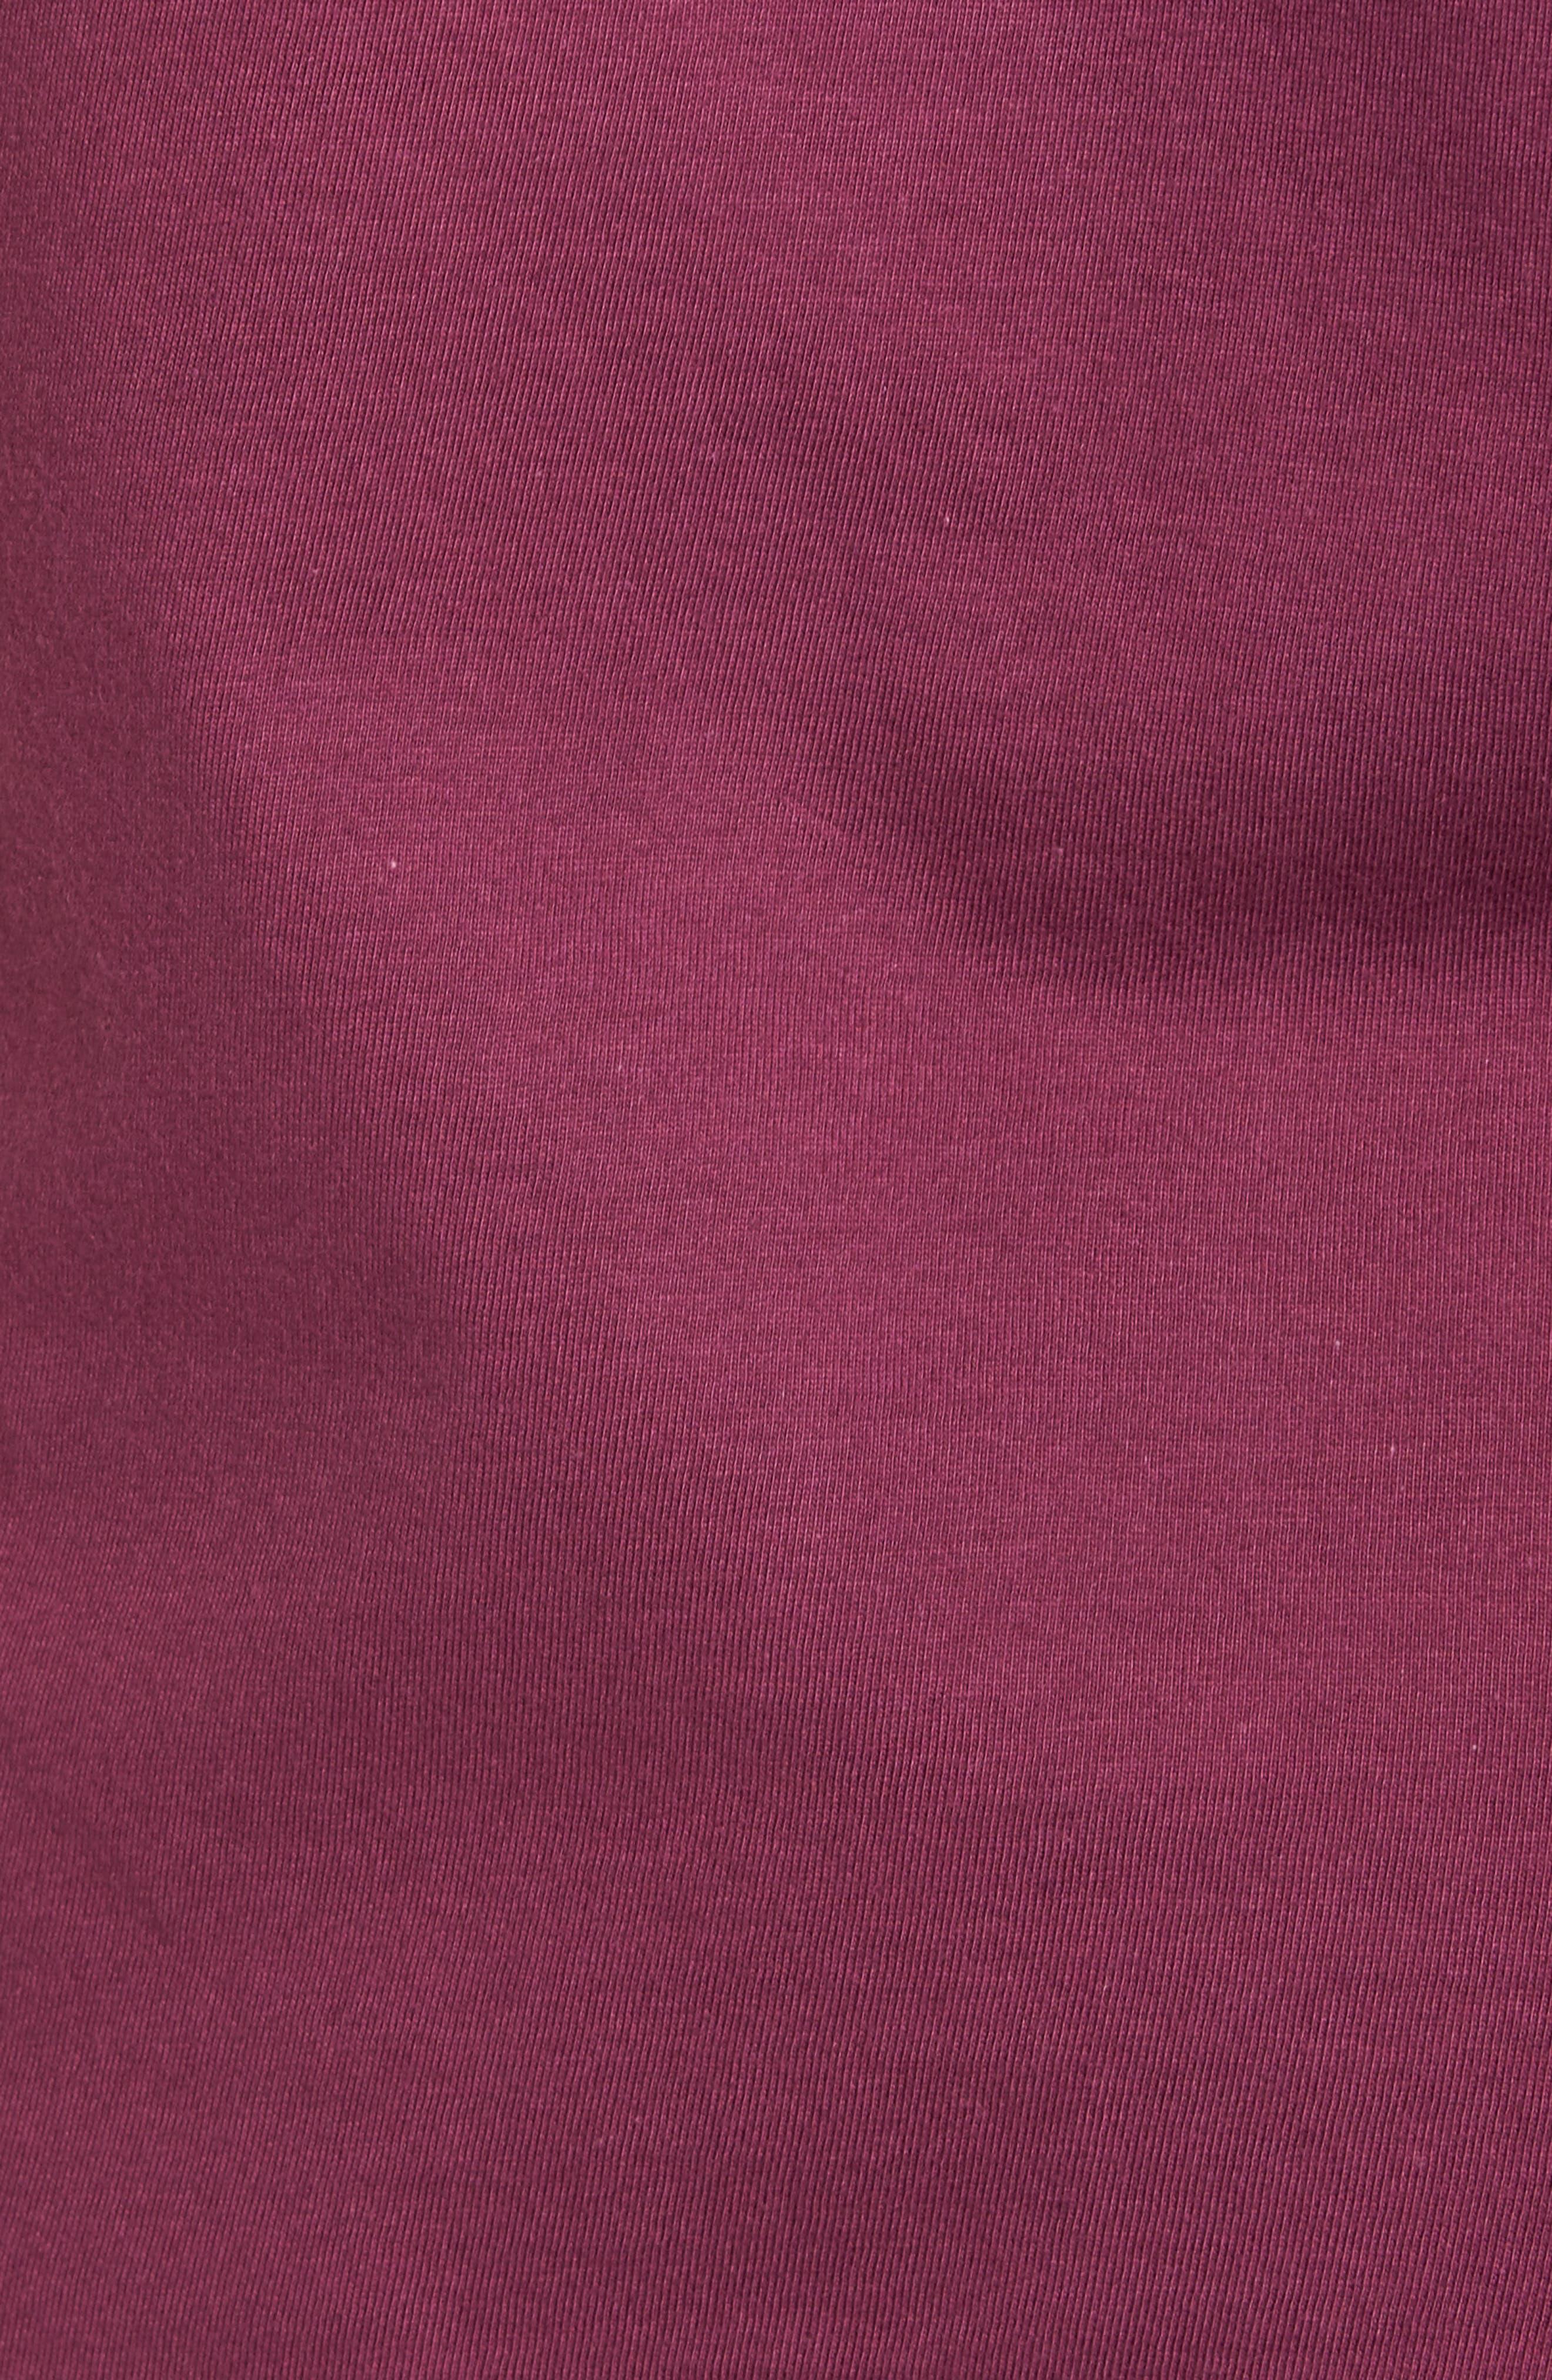 Creep Scan T-Shirt,                             Alternate thumbnail 5, color,                             930